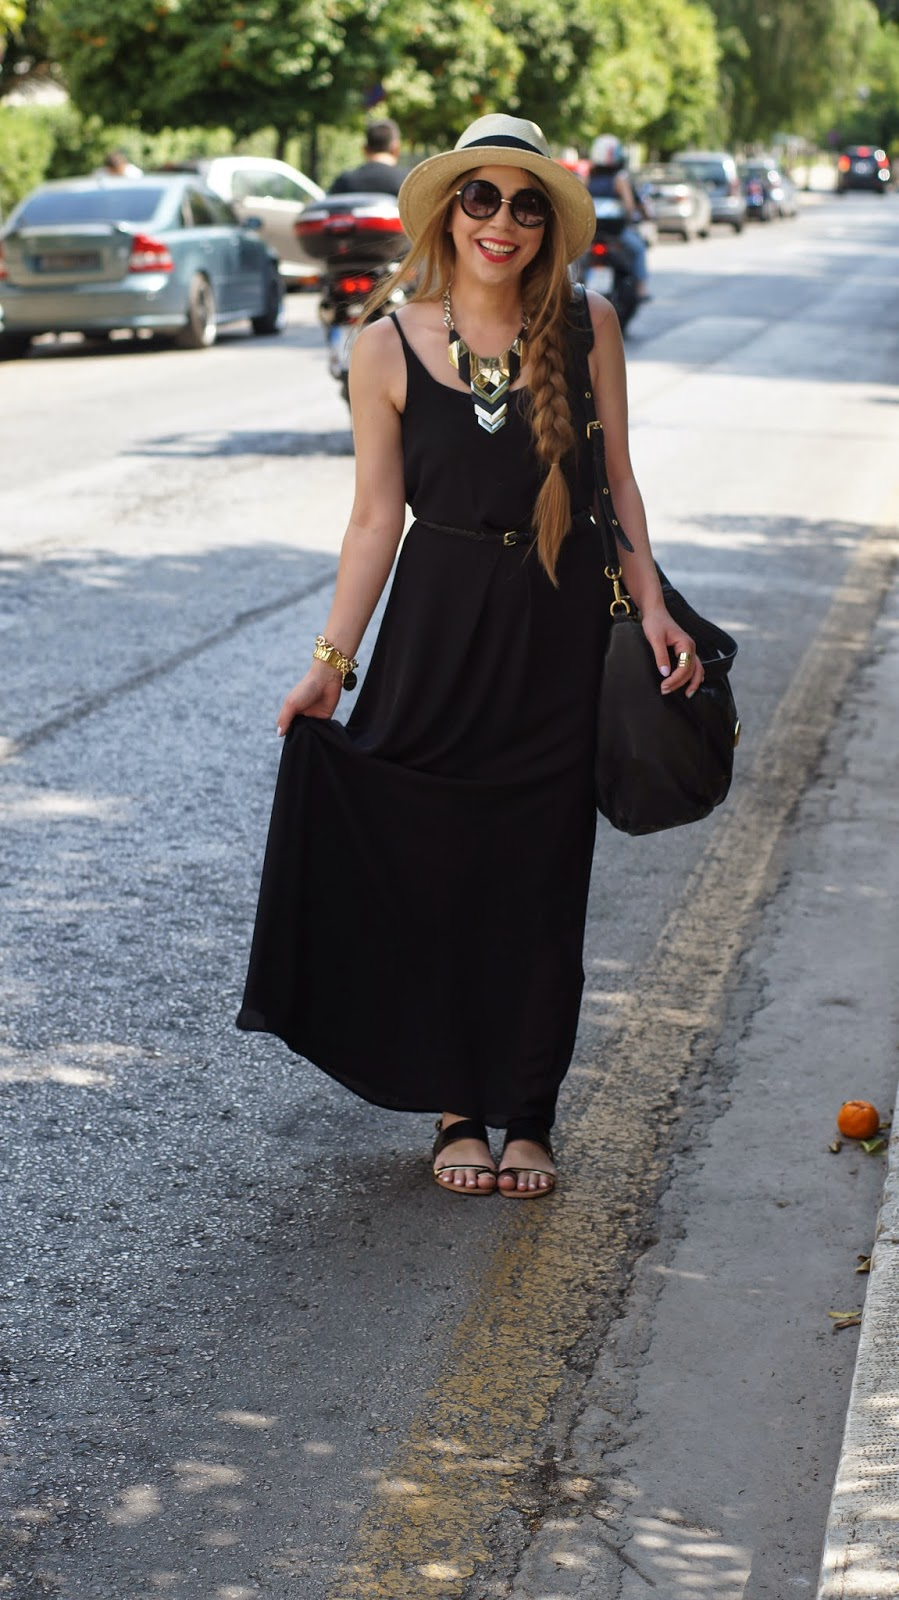 Maxi dress black h&m blazer with zipper sleeves